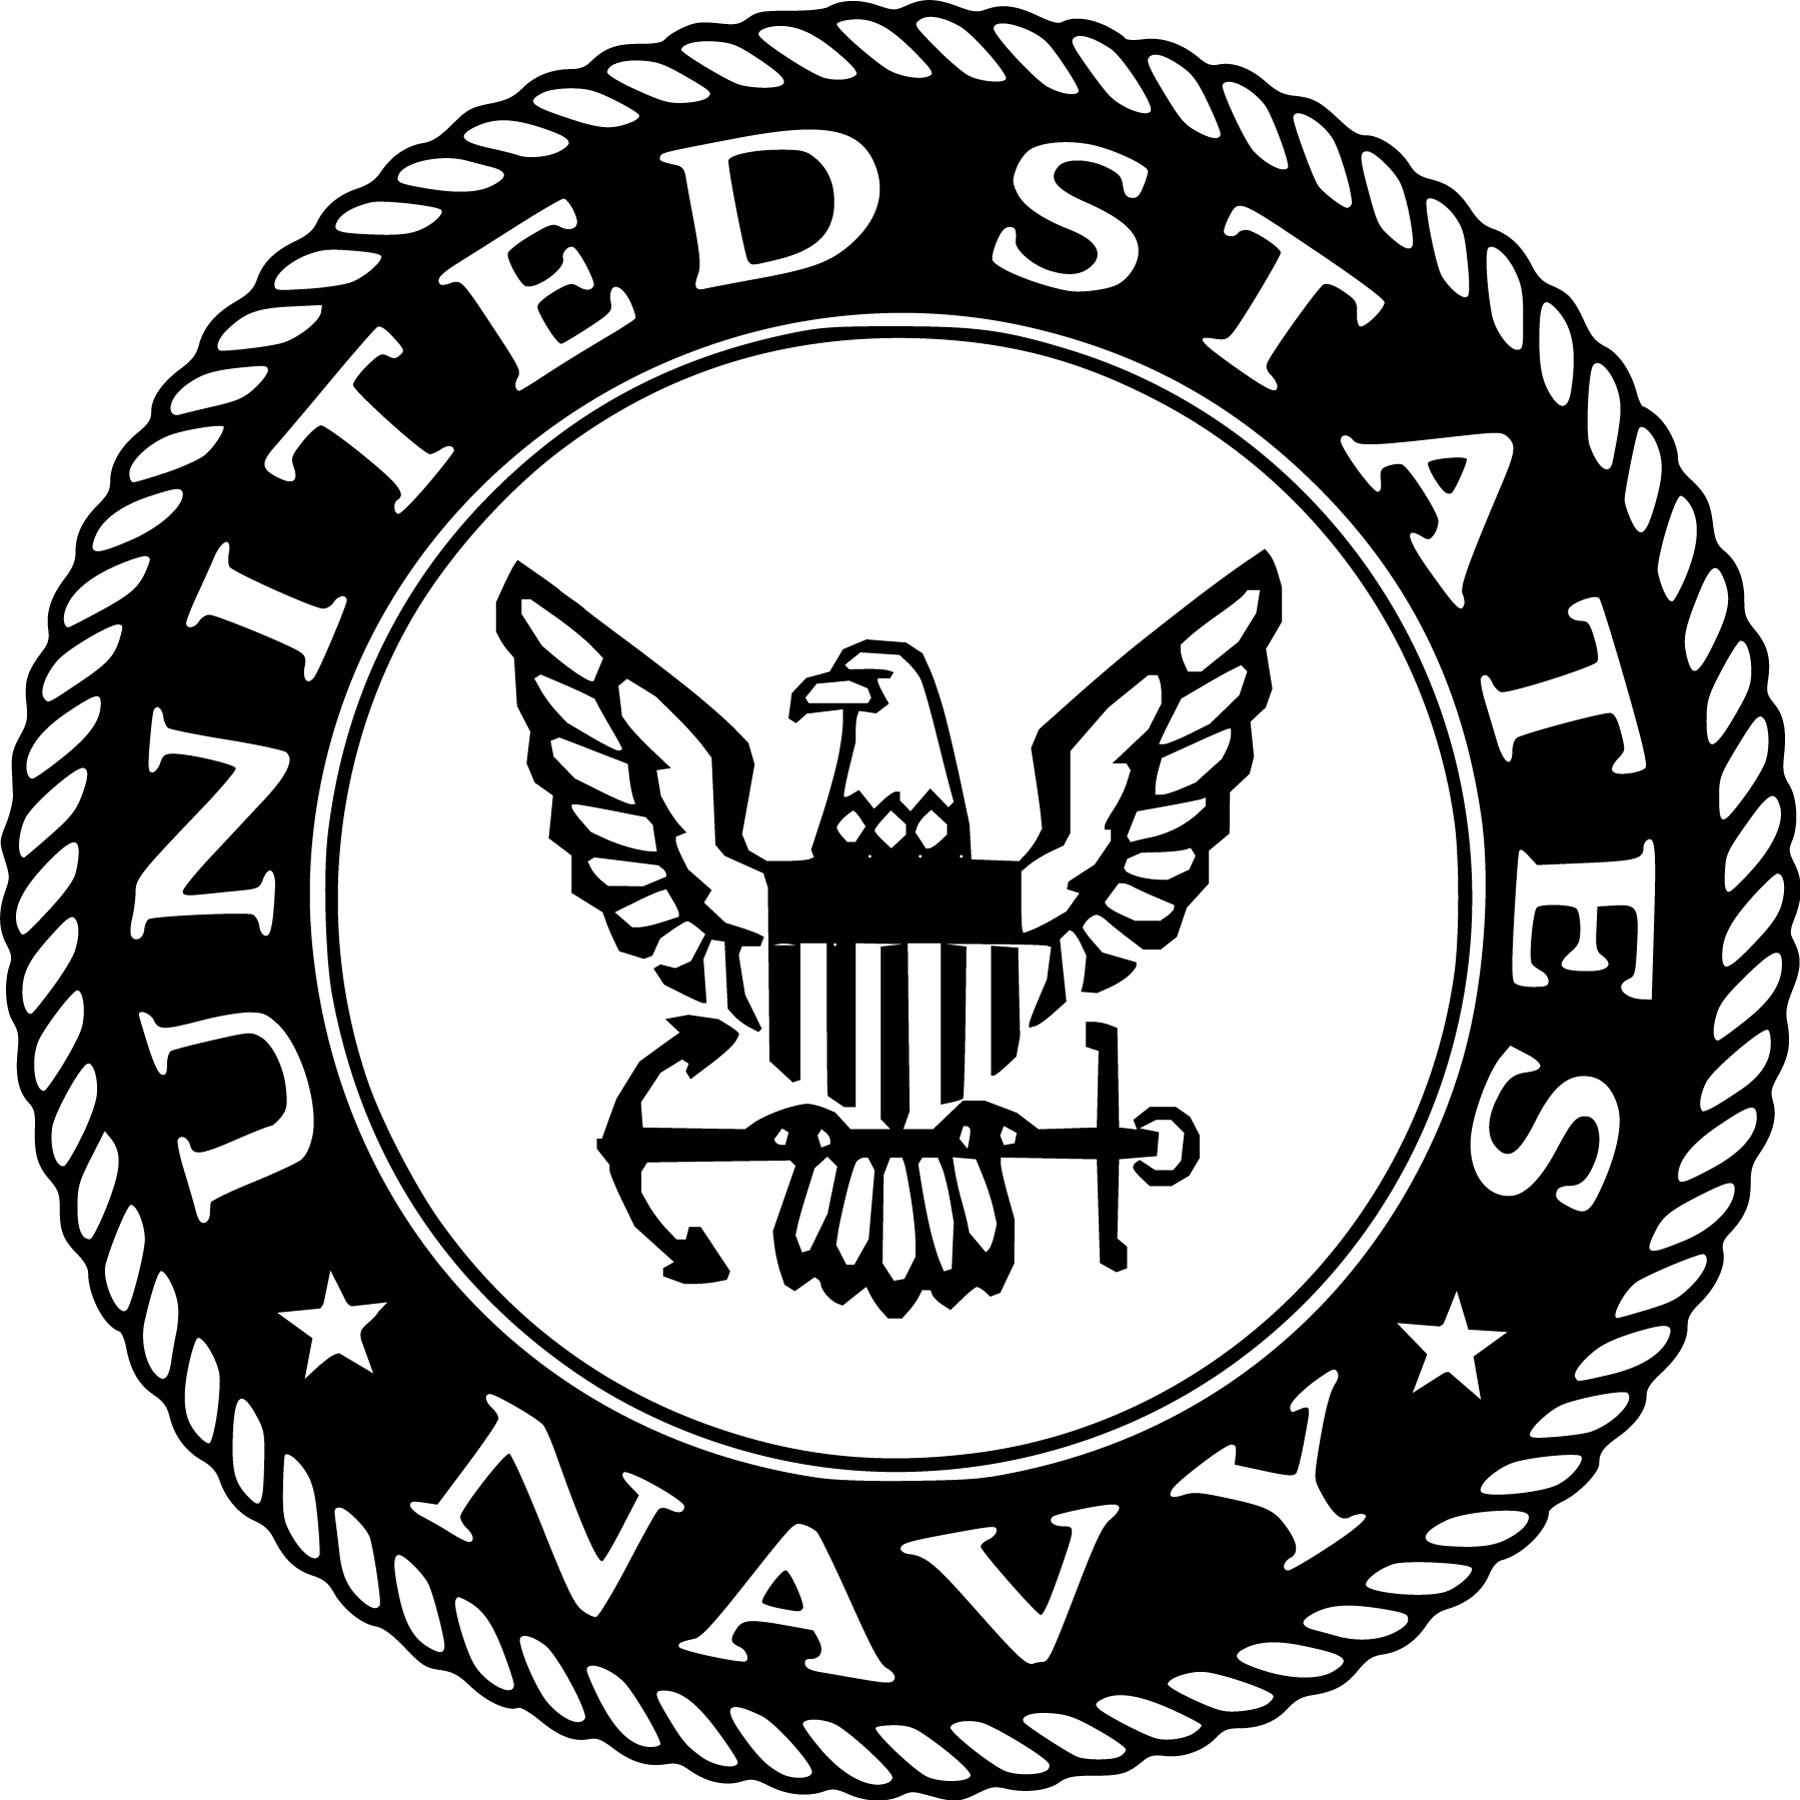 navy.jpg?time=1598314547